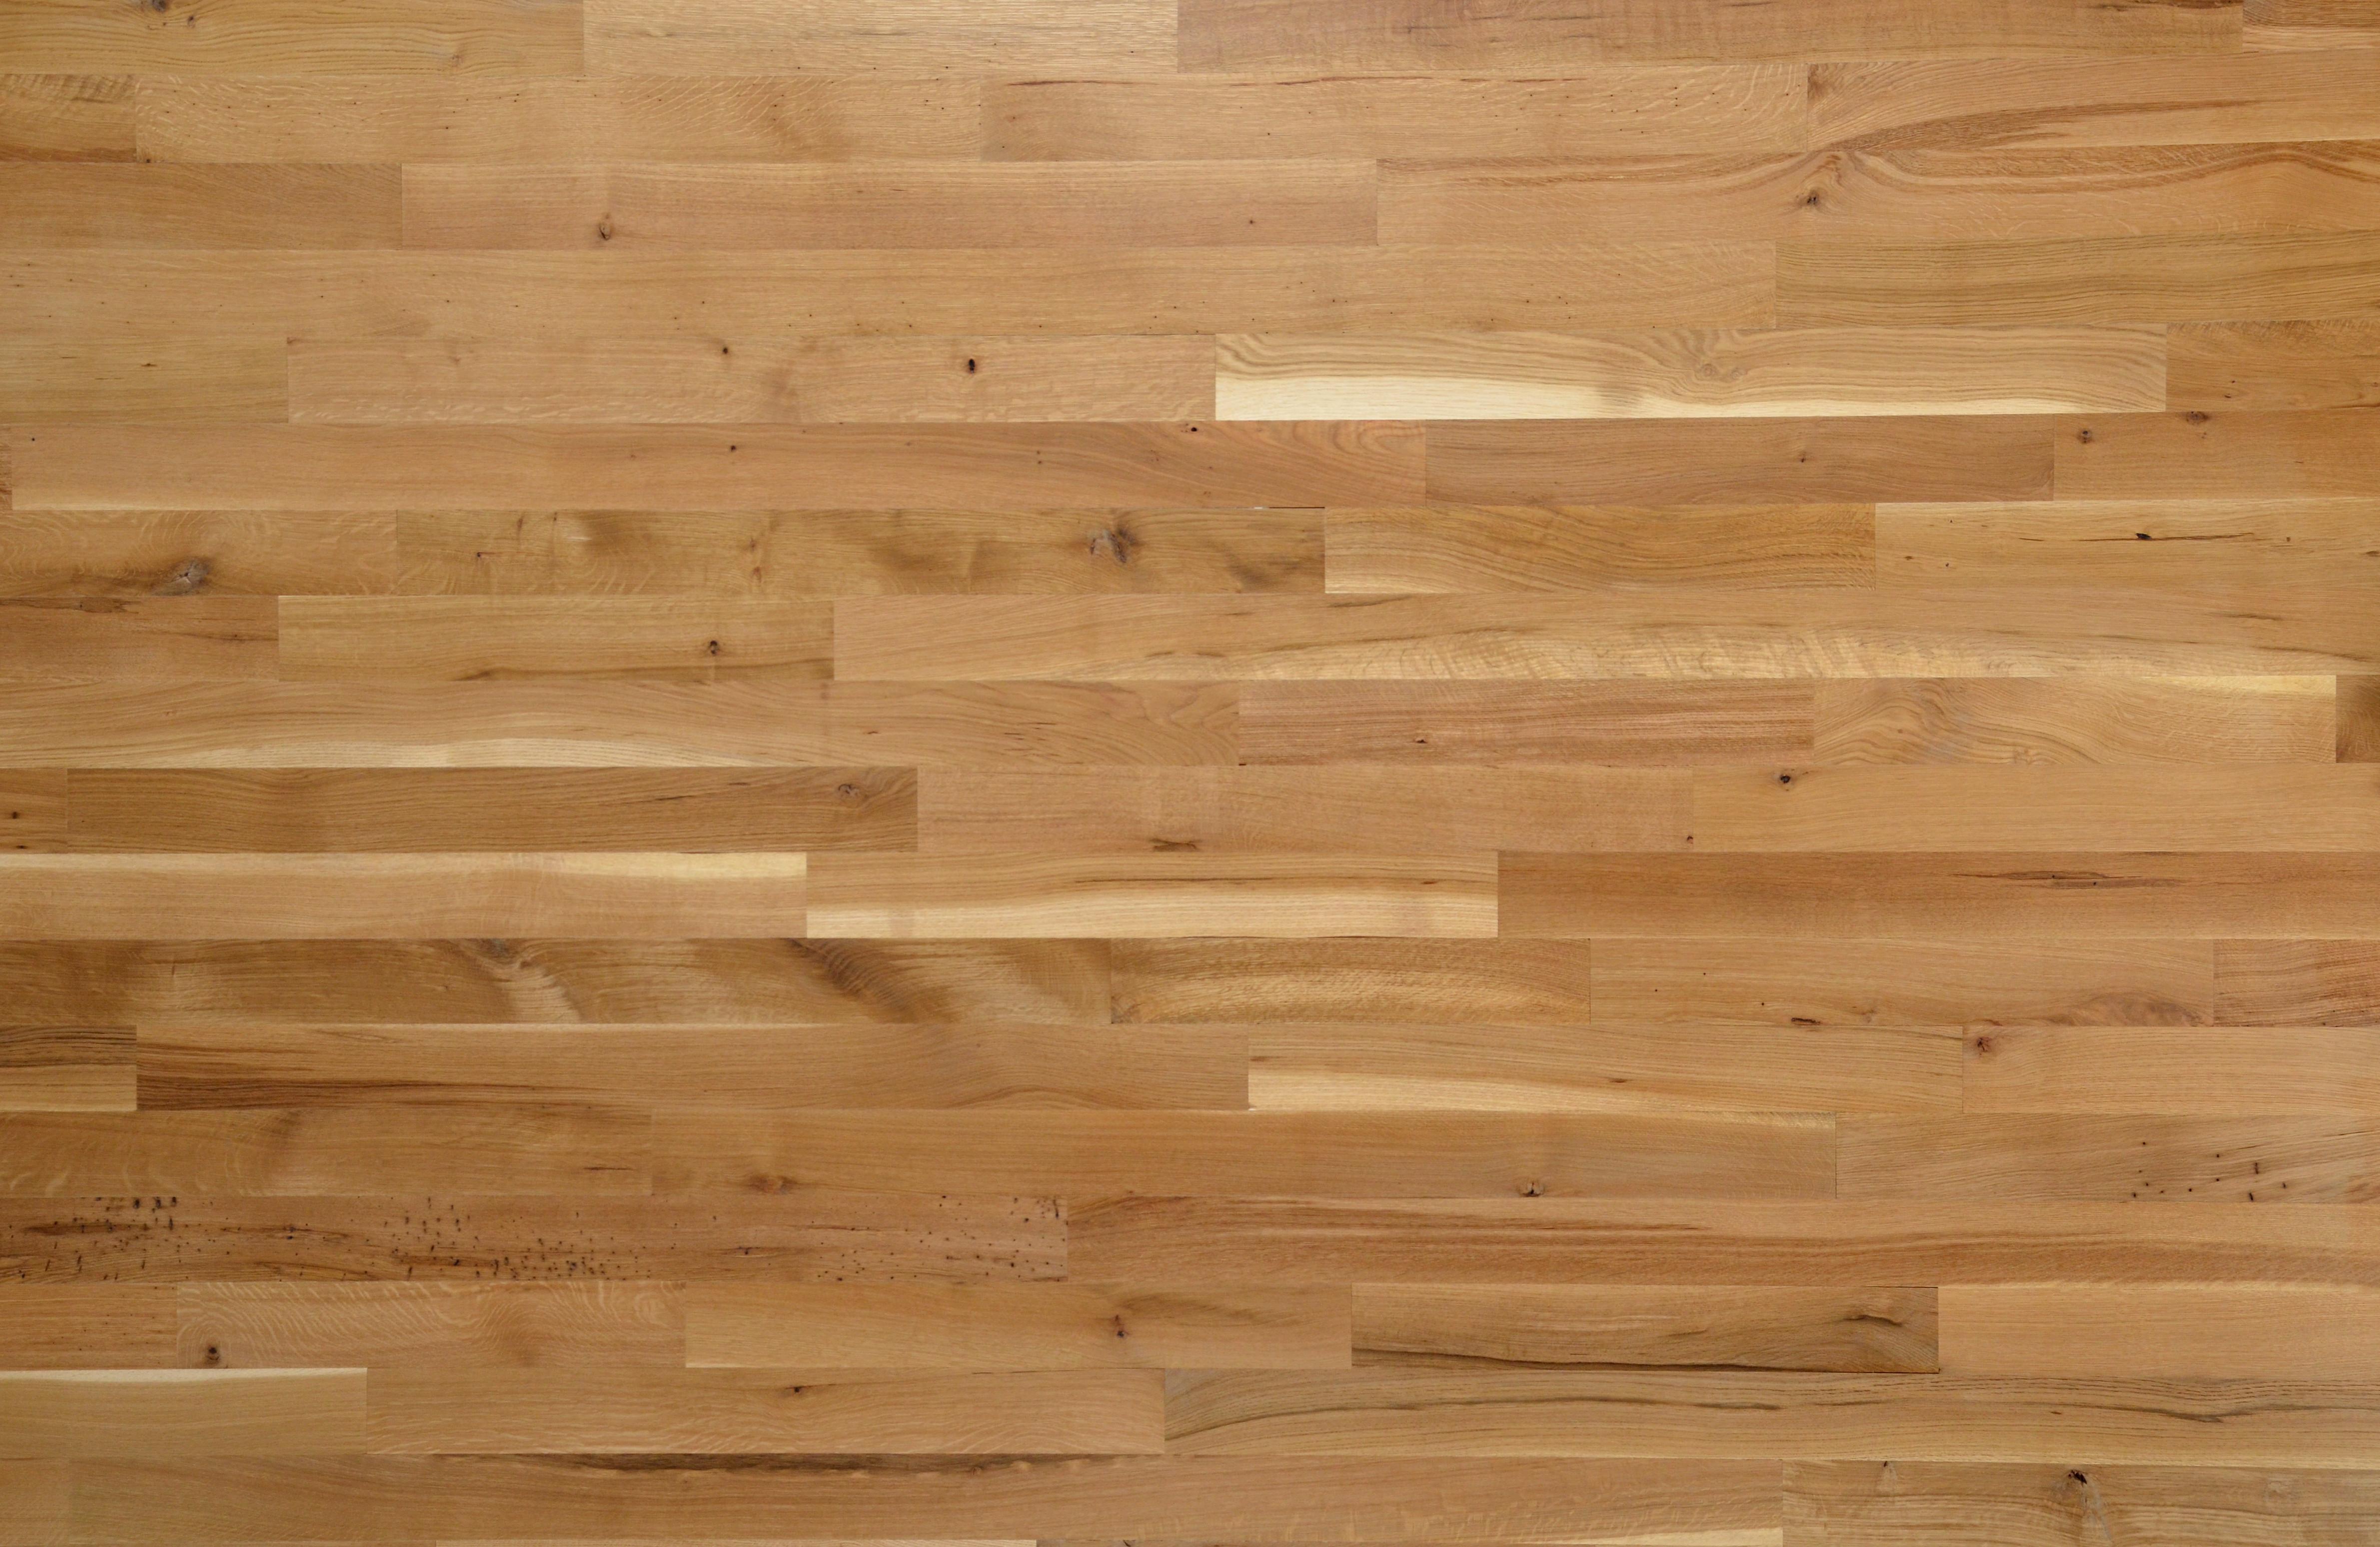 hardwood floor installation atlanta of lacrosse hardwood flooring walnut white oak red oak hickory with rift quartered natural white oak